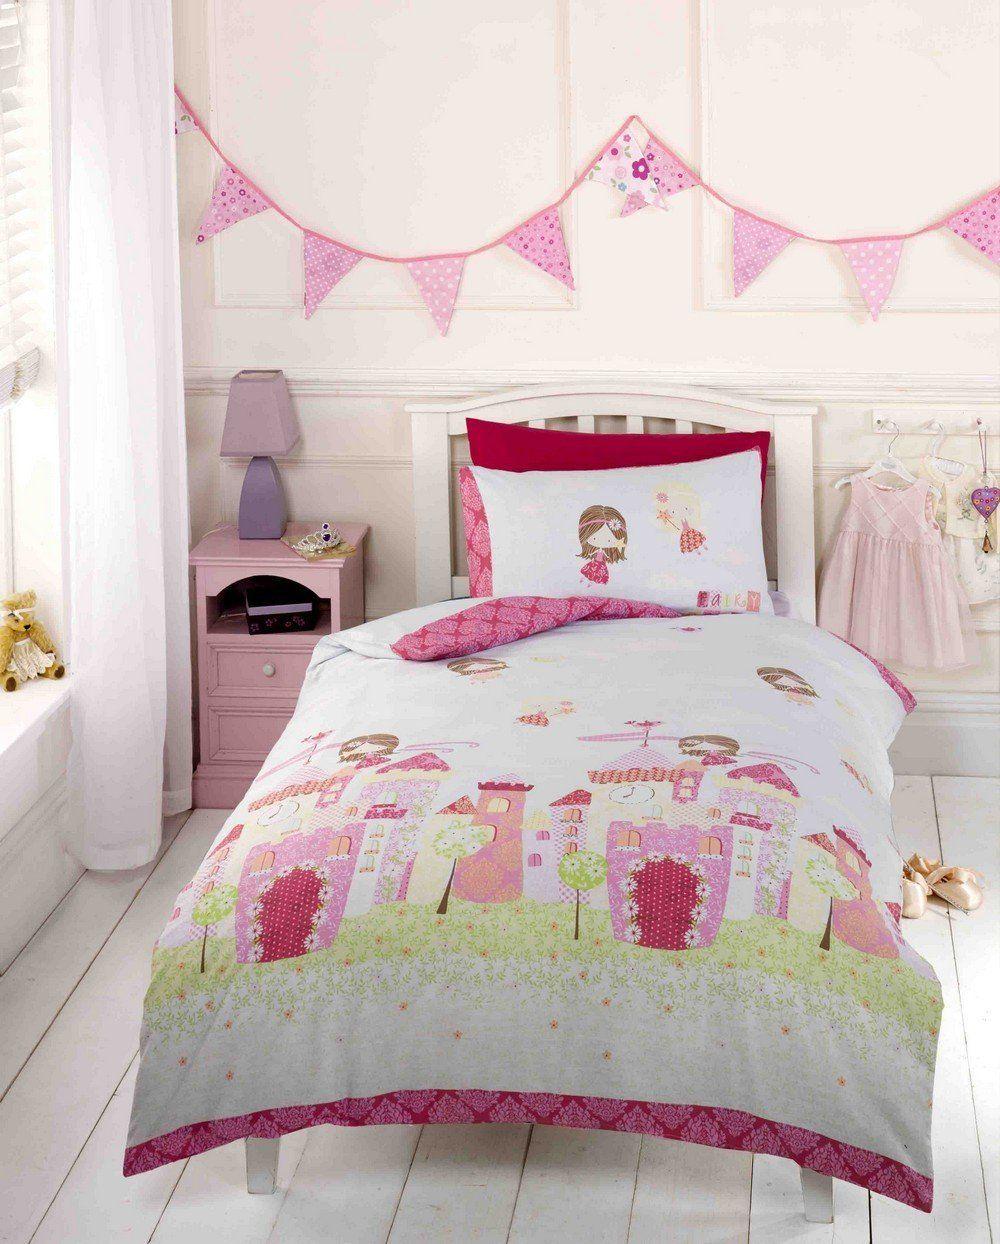 S Pink Fairy Castle Tale Princess Toddler Duvet Cover Bedding Bed Set